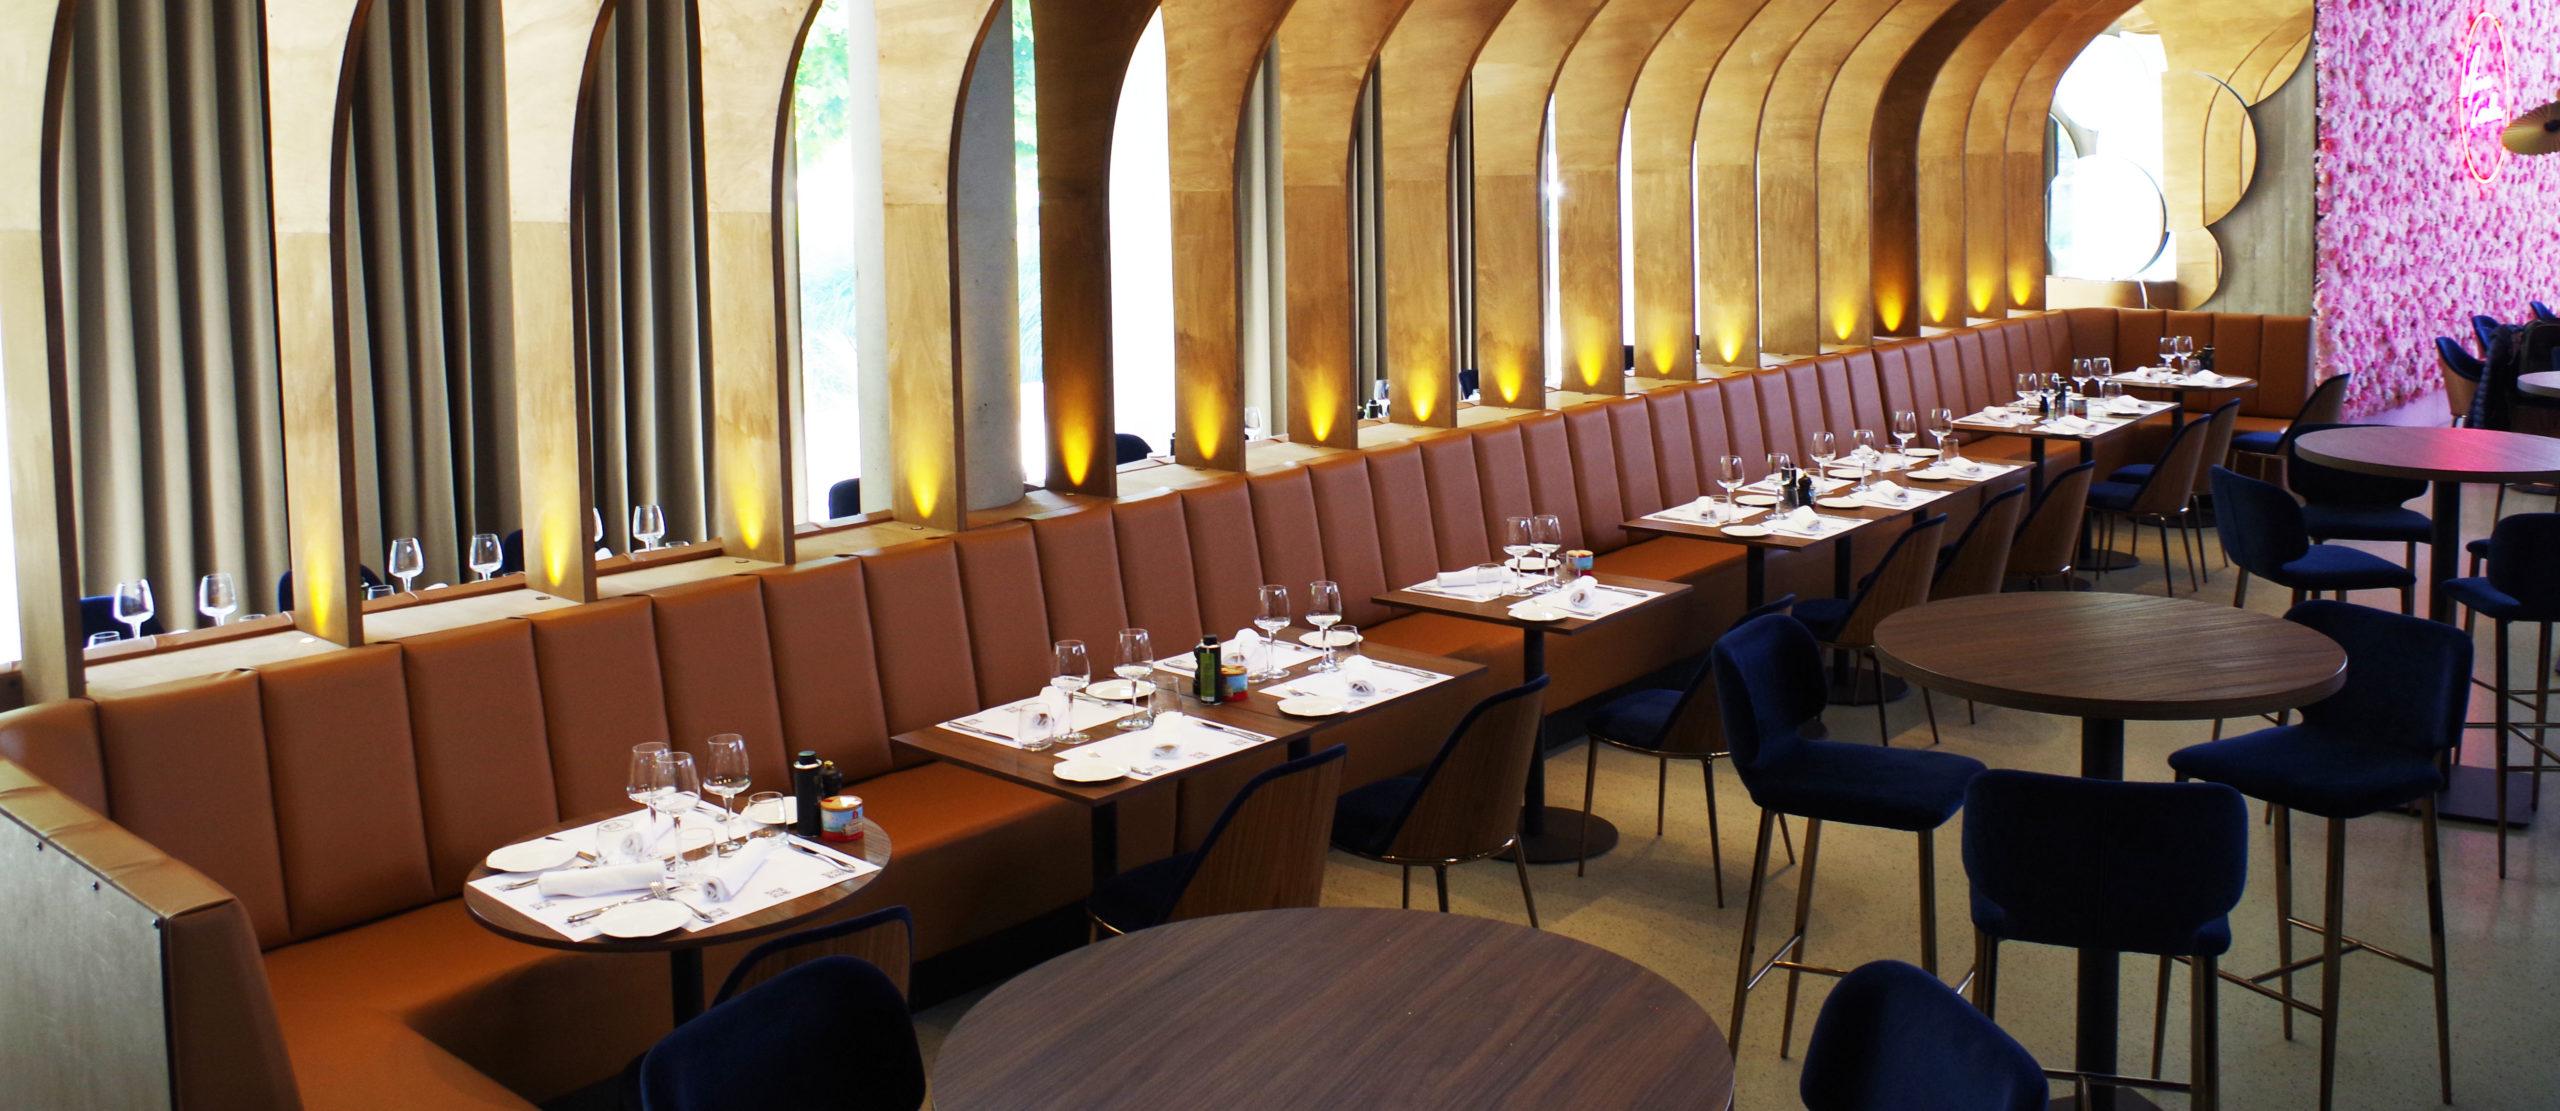 AvvaGarden-Restaurant-Salleinterieu